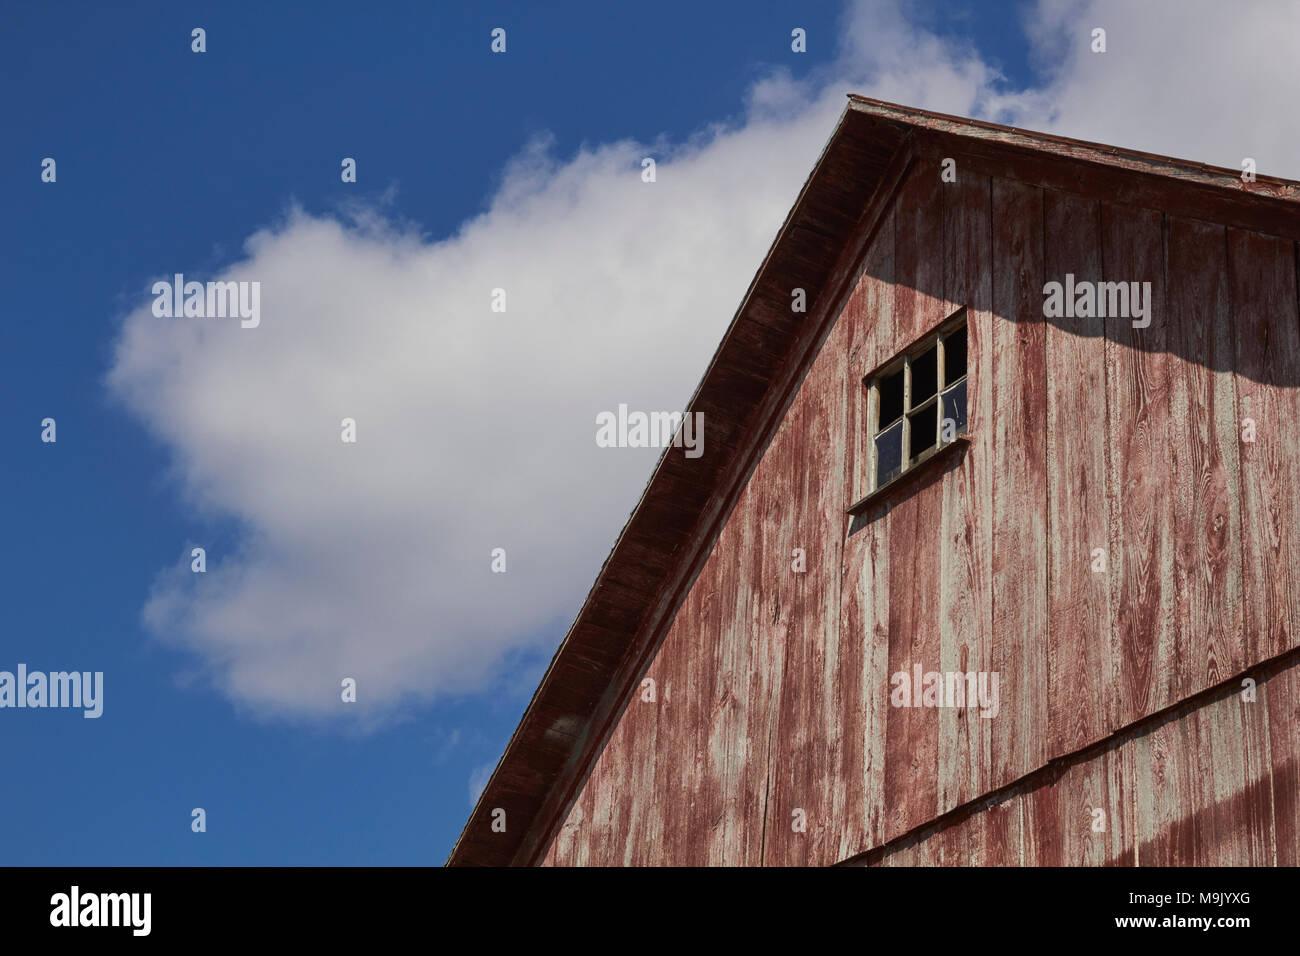 Pennsylvania dutch barn stock photos pennsylvania dutch barn a weathered red wooden barn against a blue sky lancaster county pennsylvania usa biocorpaavc Images